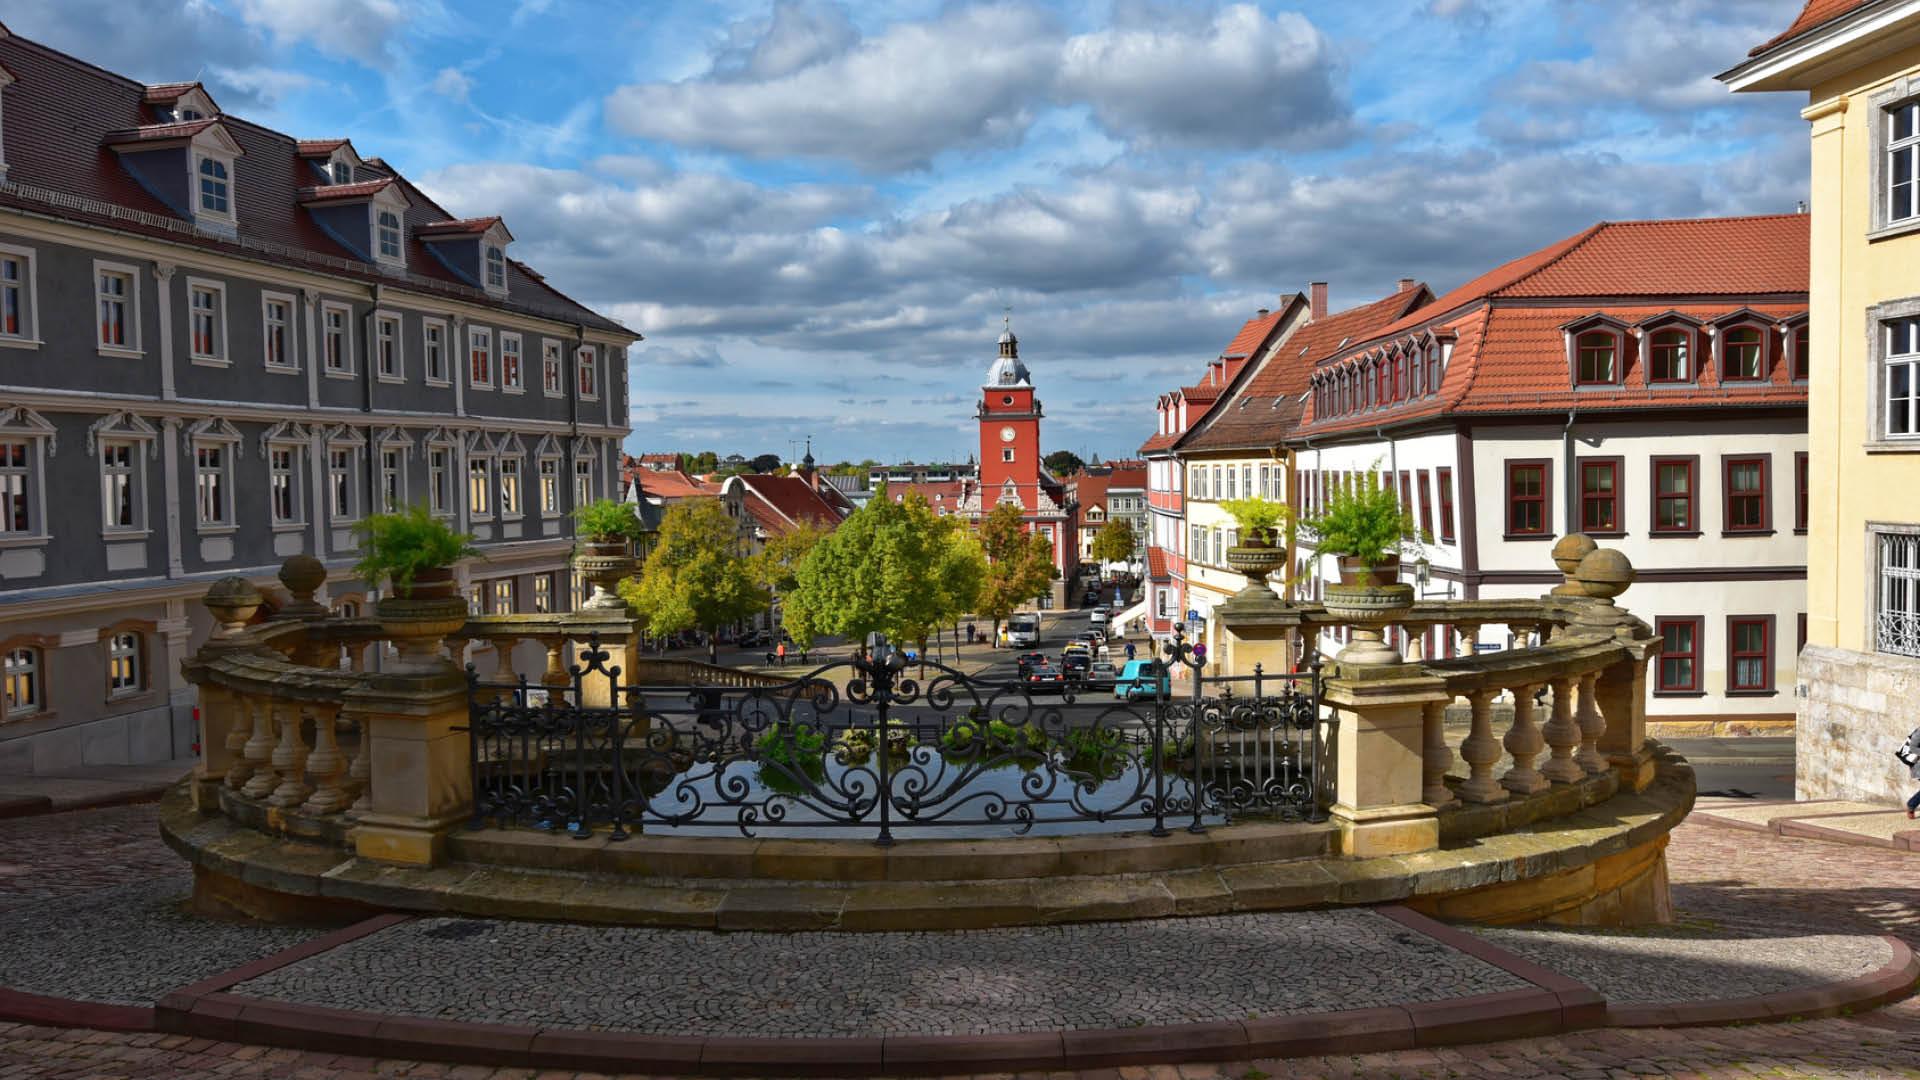 Gotha, Blick auf den Hauptmarkt   © Uwe Albert-Thiele - fotolia.com